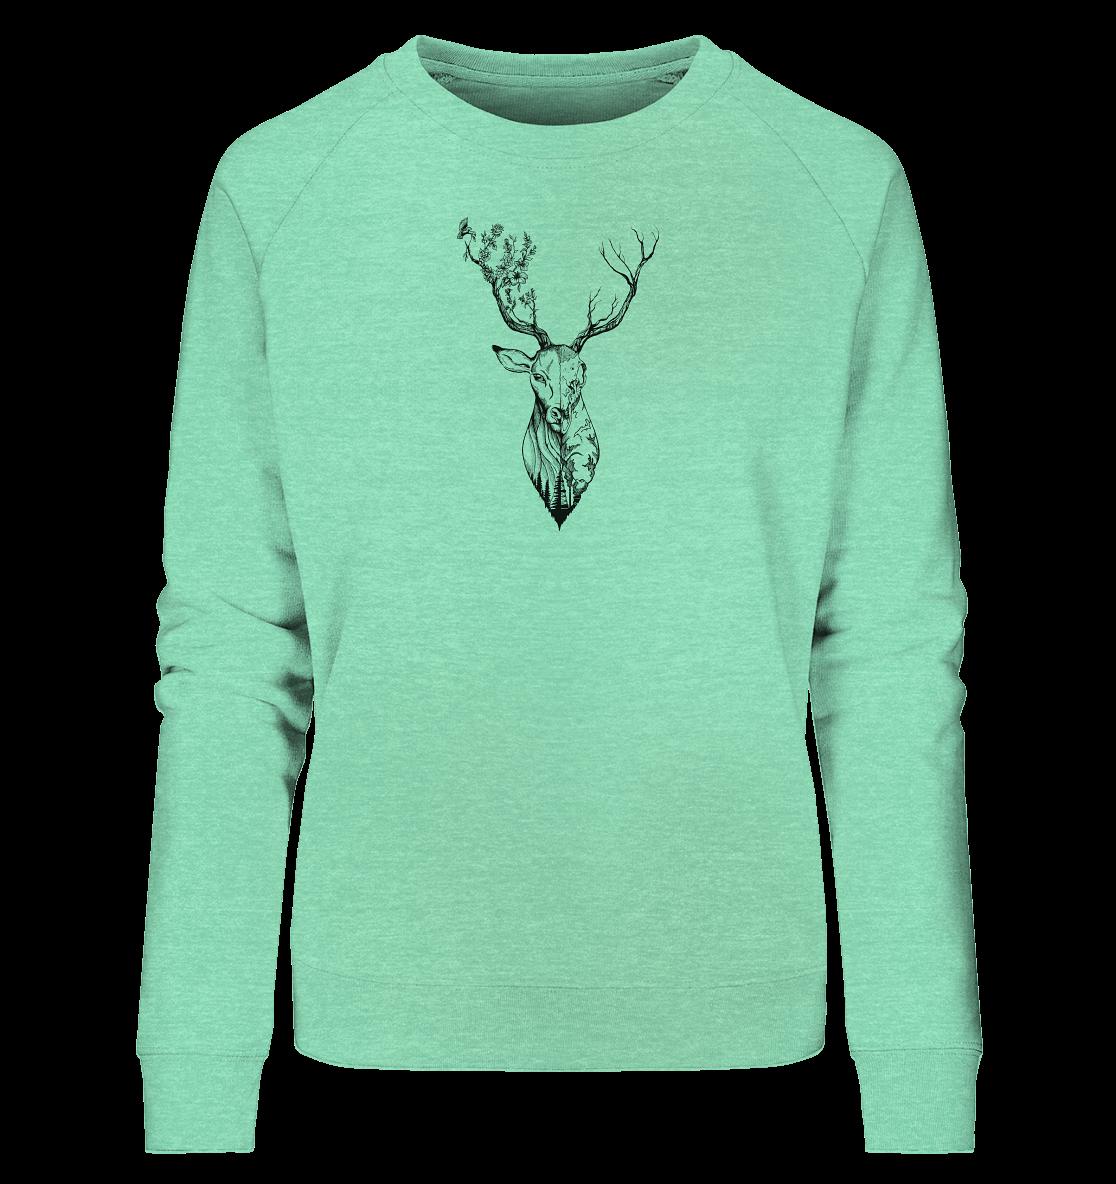 front-ladies-organic-sweatshirt-84e5bd-1116x-8.png